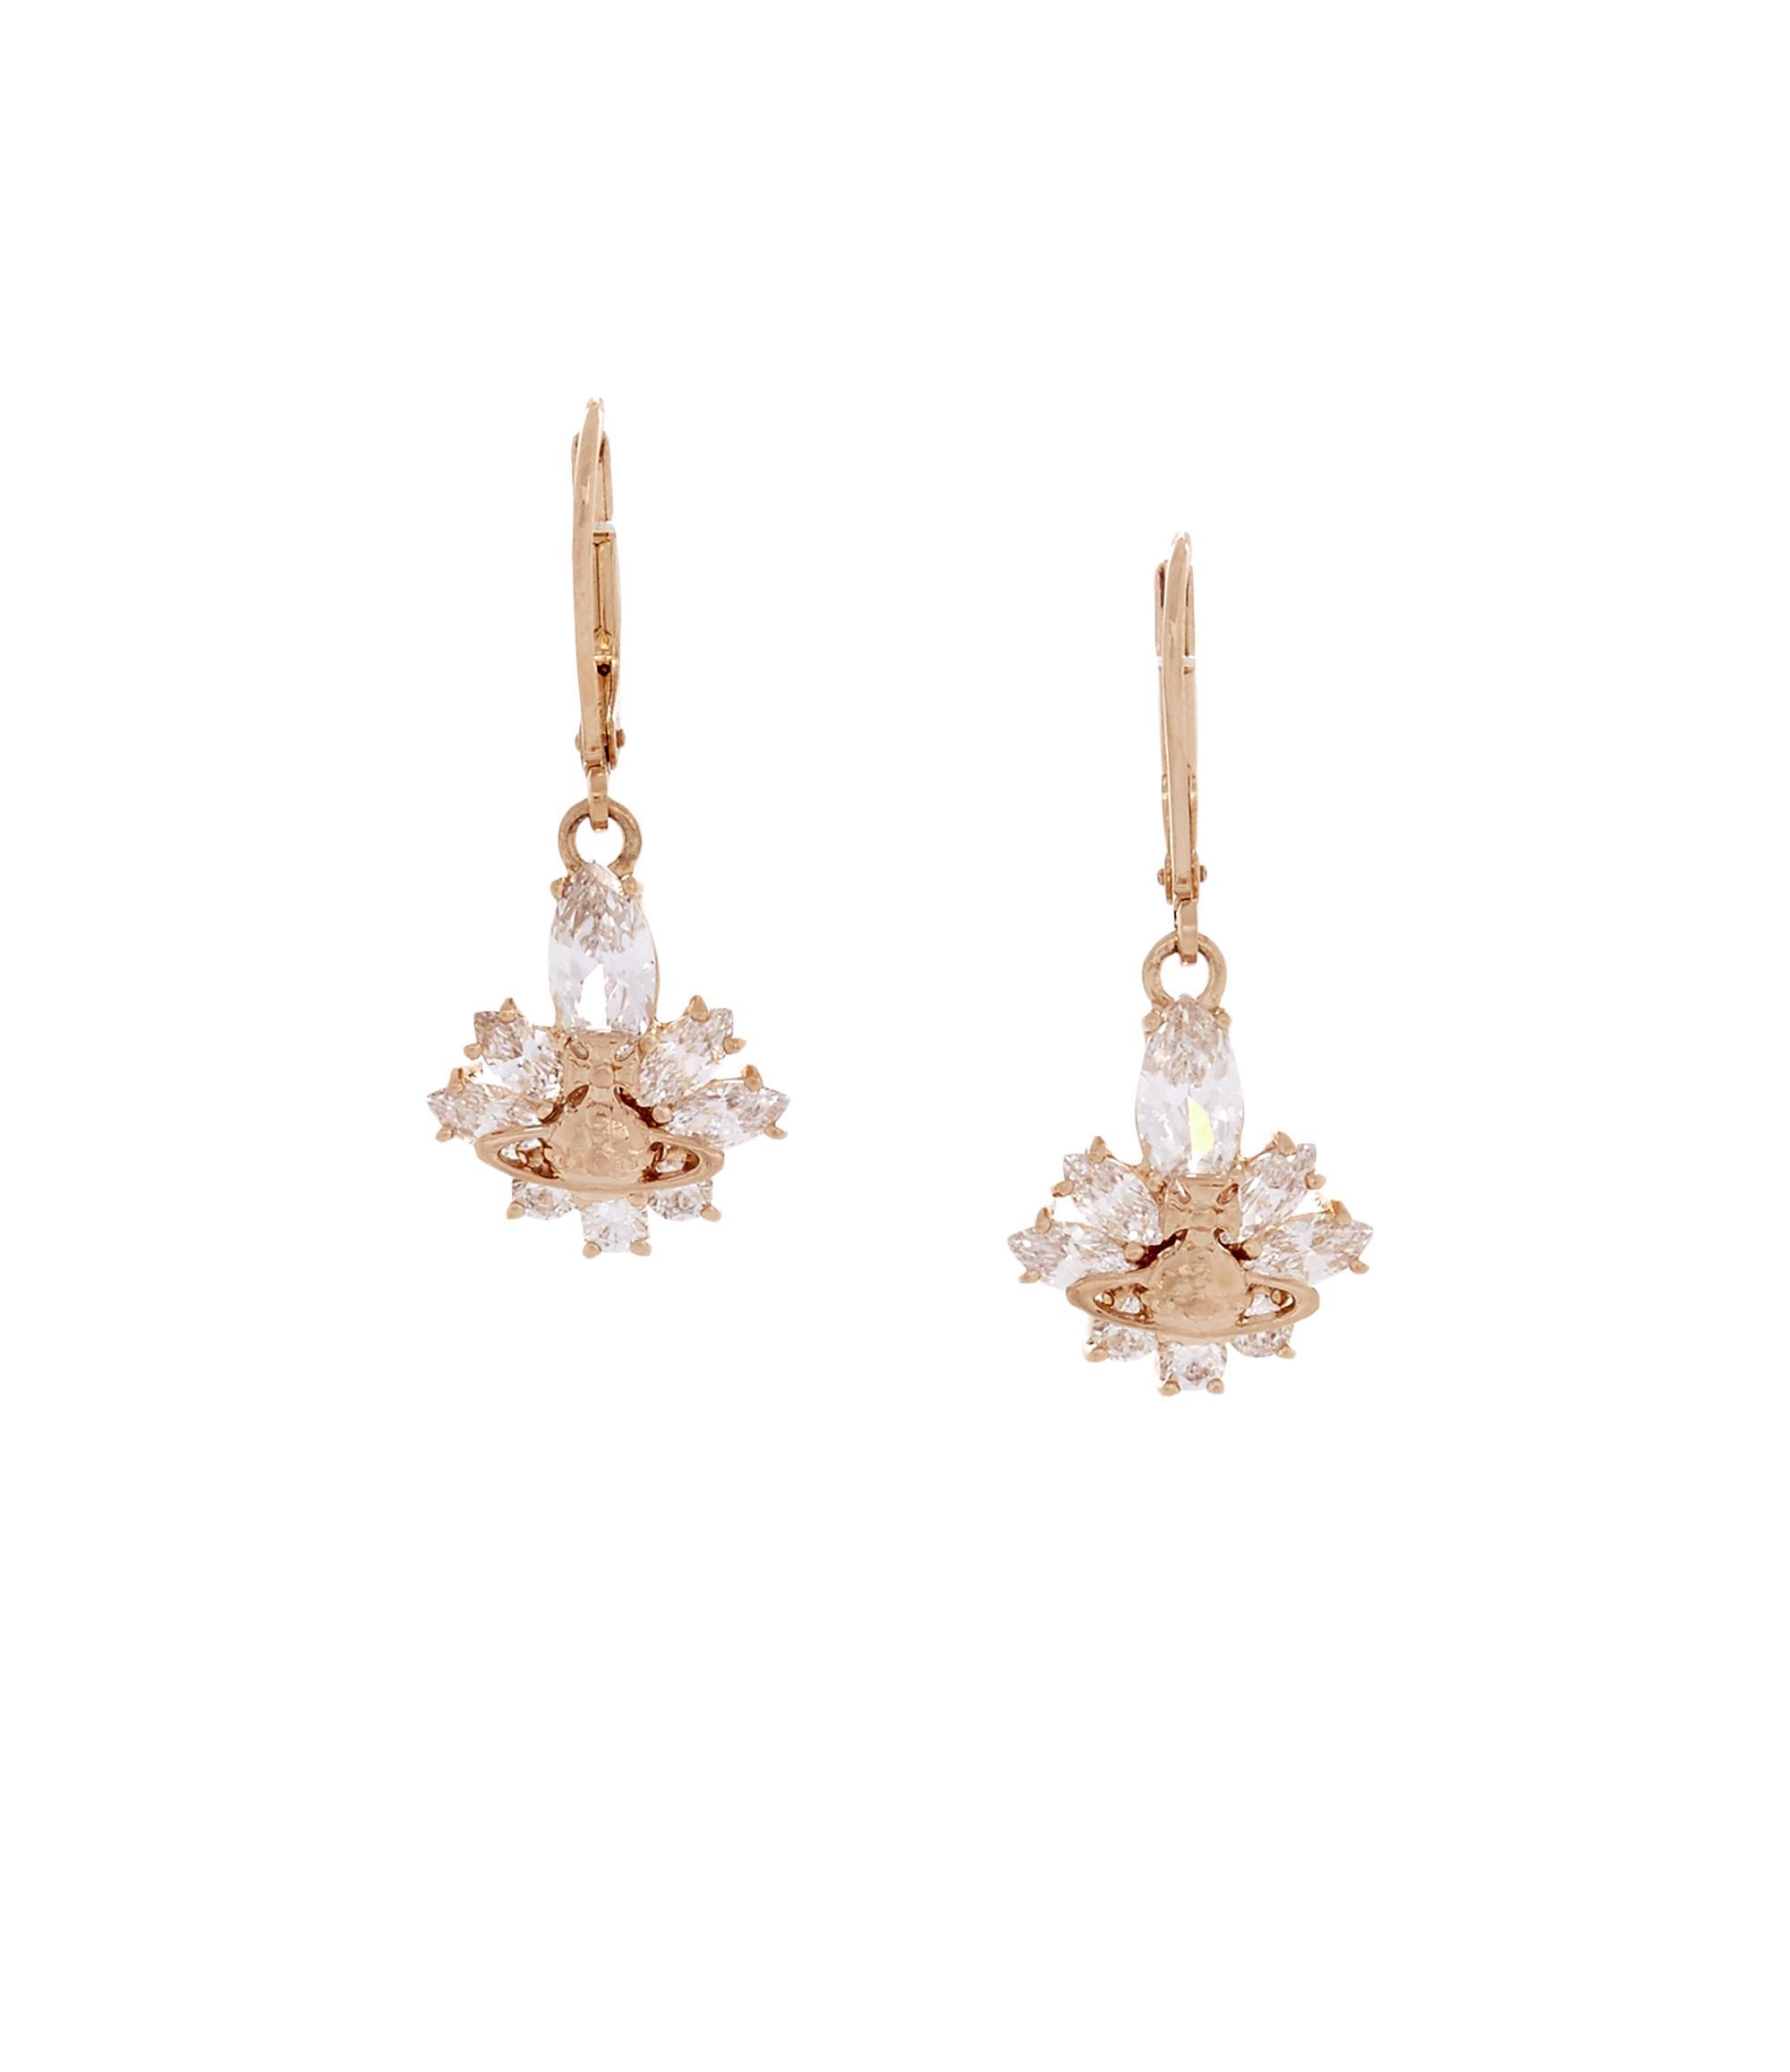 a7c6174f8c614 Vivienne Westwood Marcia Drop Earrings Pink Gold in White Cubic Zirconia /  White Enamel